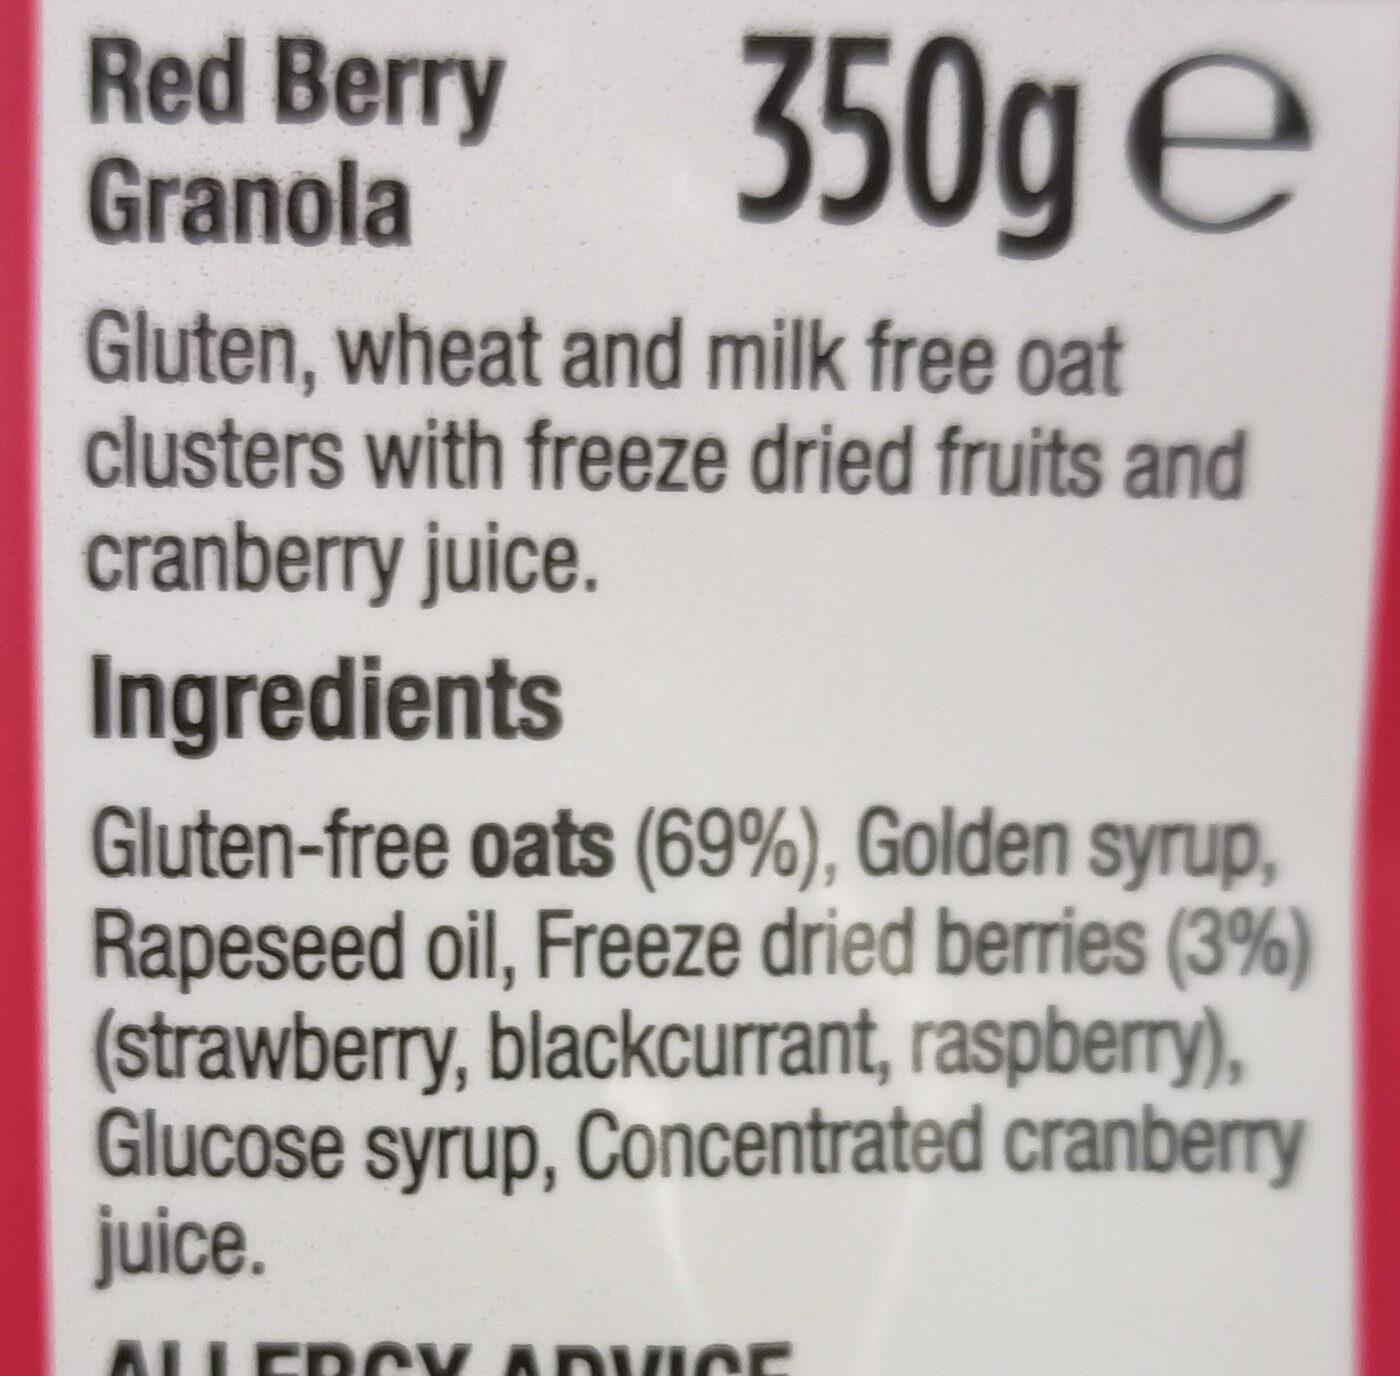 red berry granola - Ingredients - en